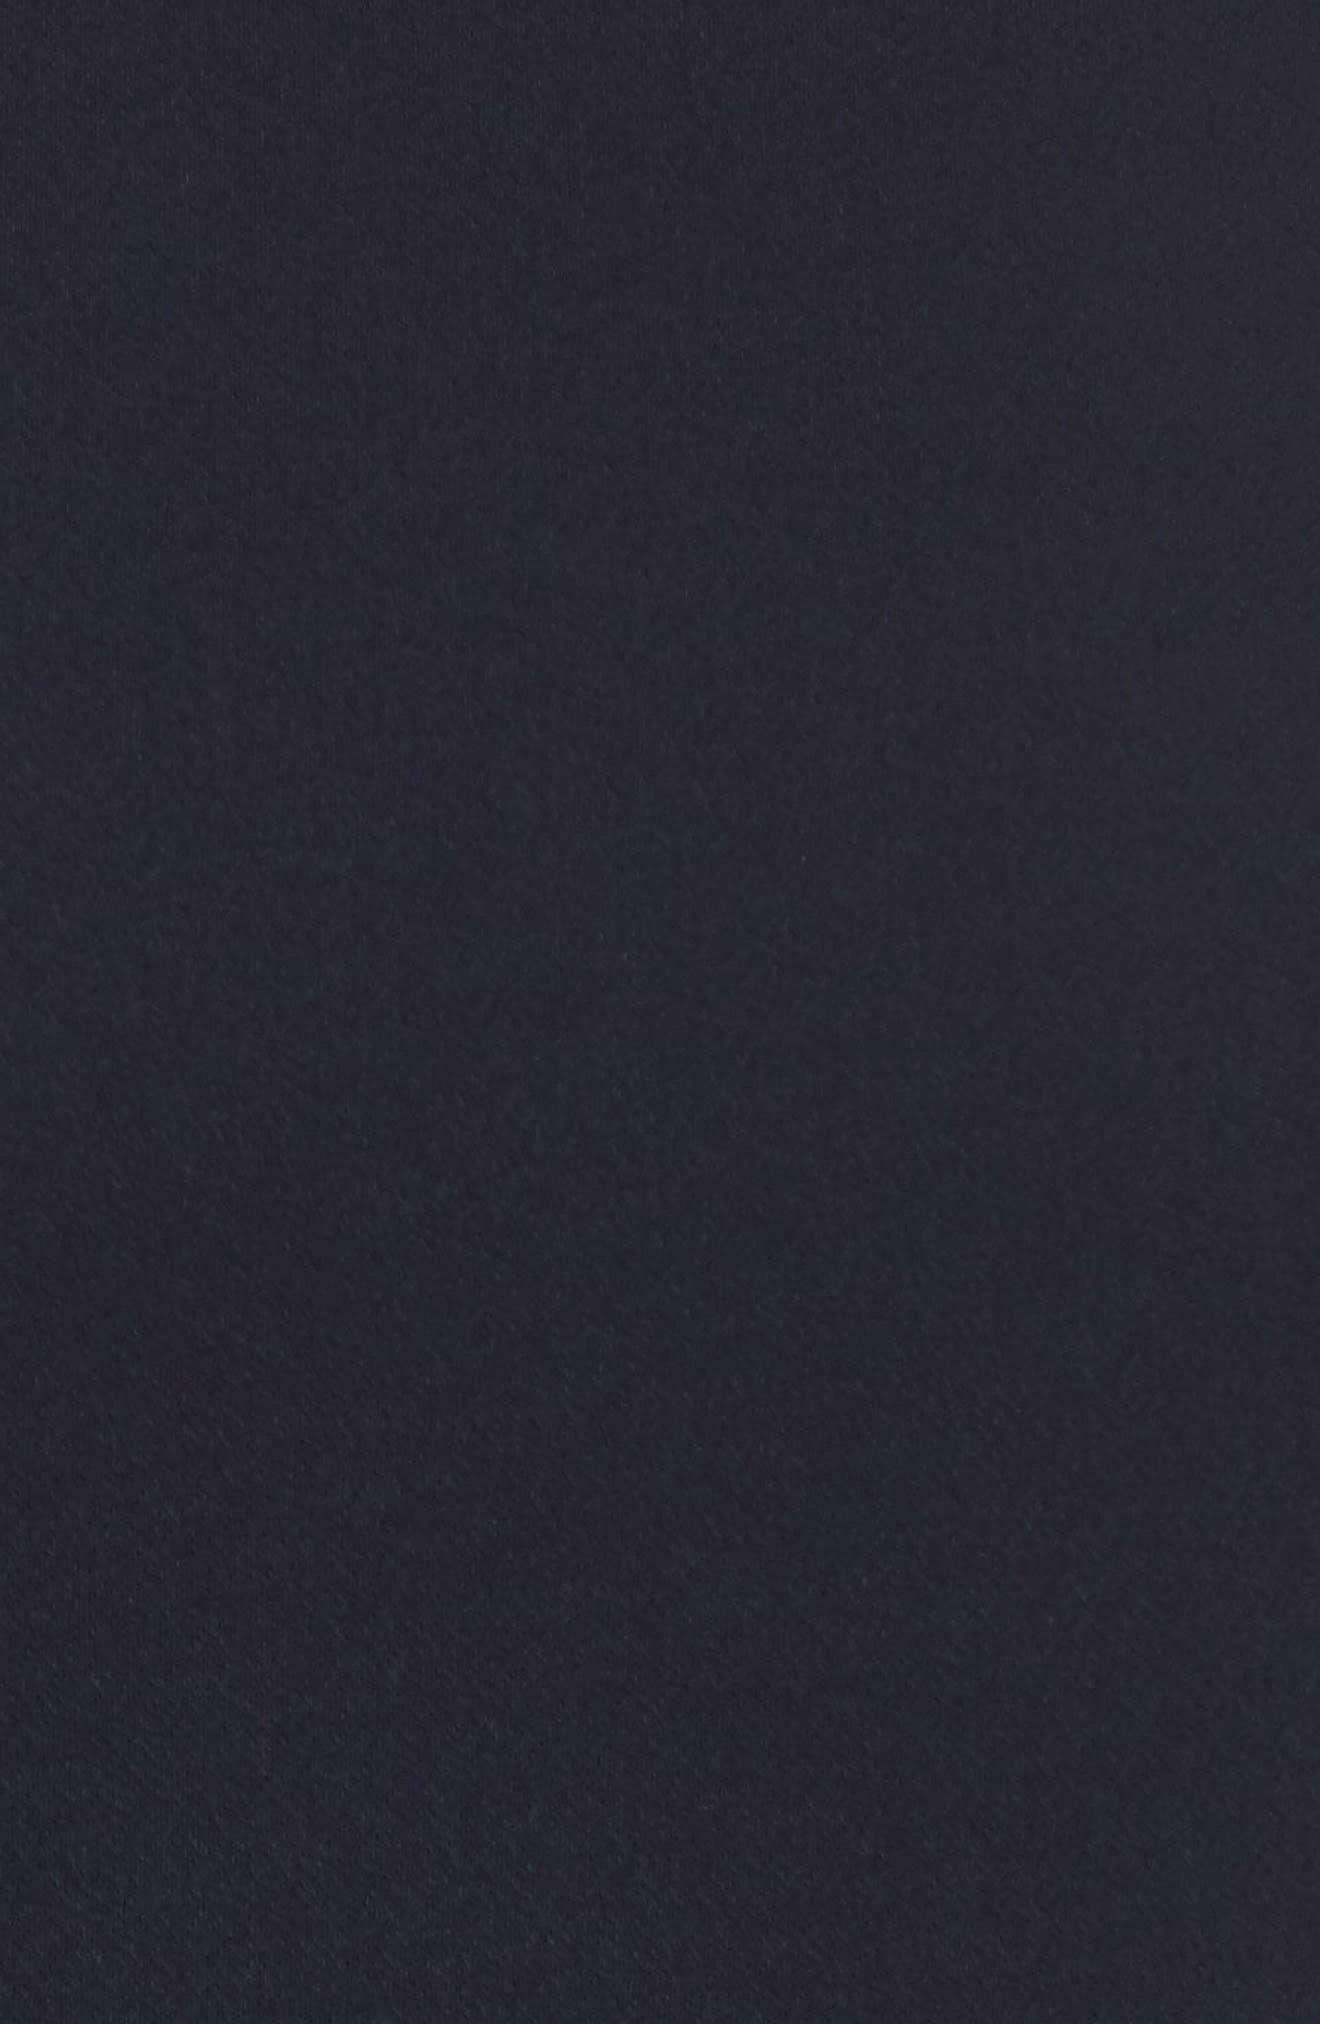 Bow Sleeve Chiffon Shift Dress,                             Alternate thumbnail 5, color,                             Navy